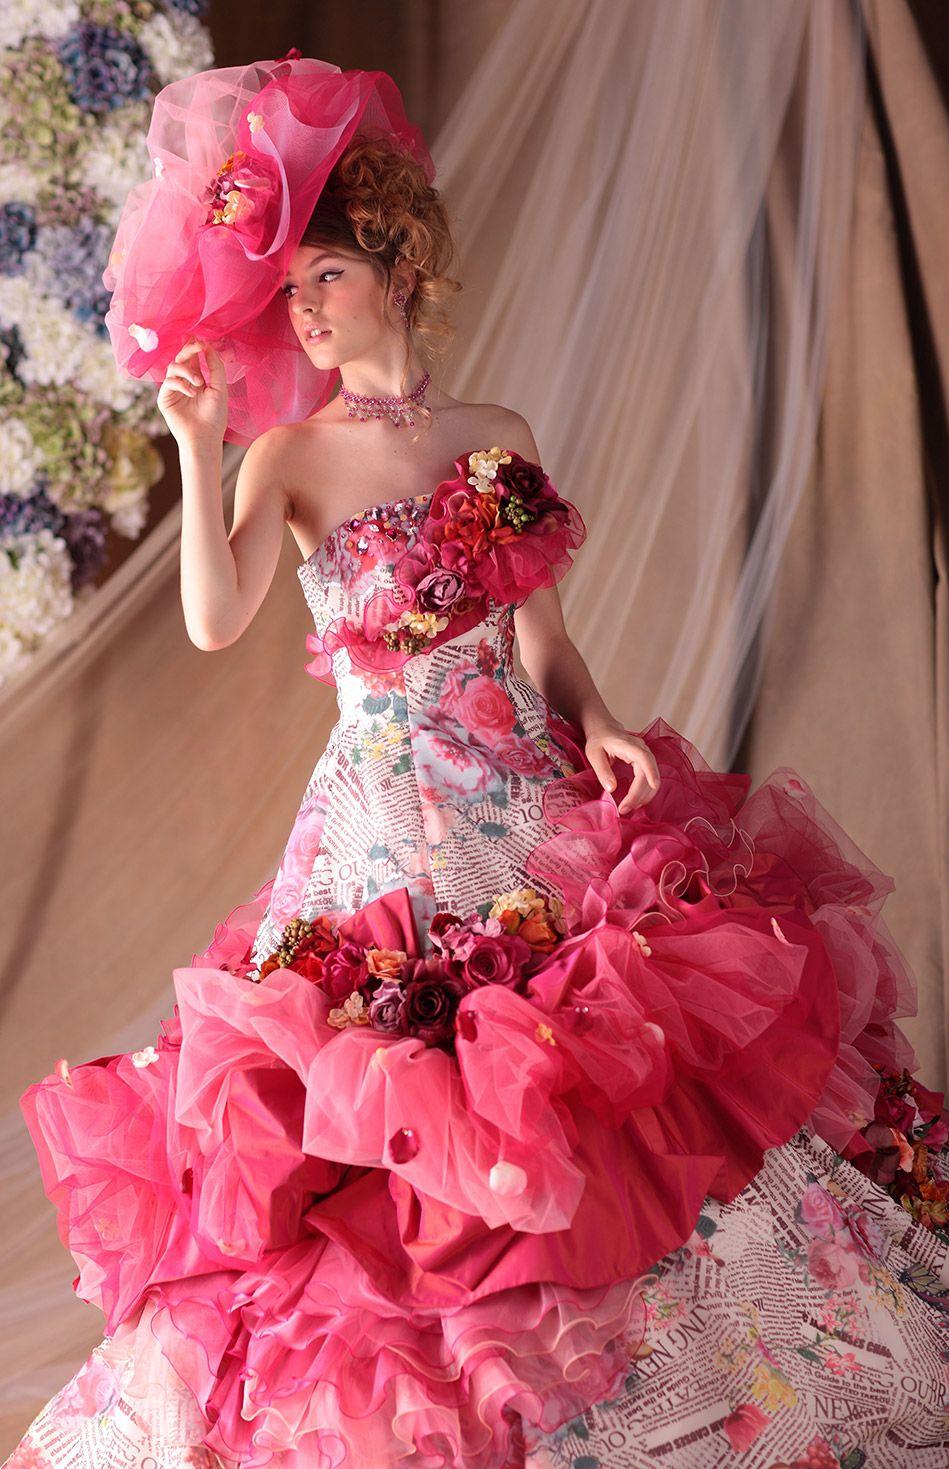 dball~dress ballgown   Ropa Espectacular   Pinterest   Alta moda y Ropa